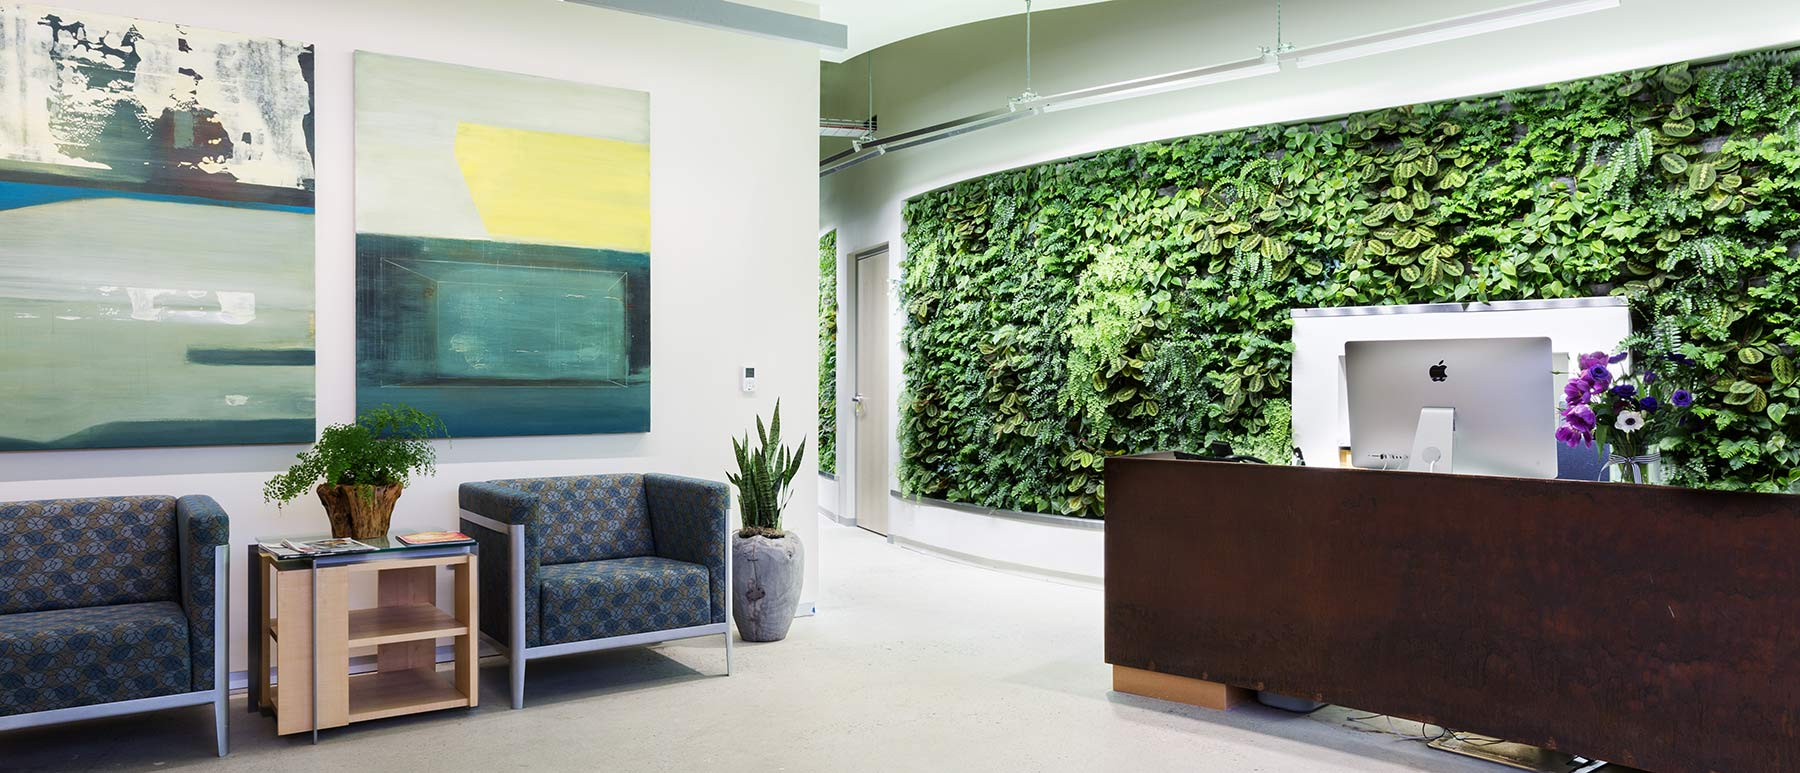 Architecture firm Arch|Nexus' new headquarters office in Sacramento